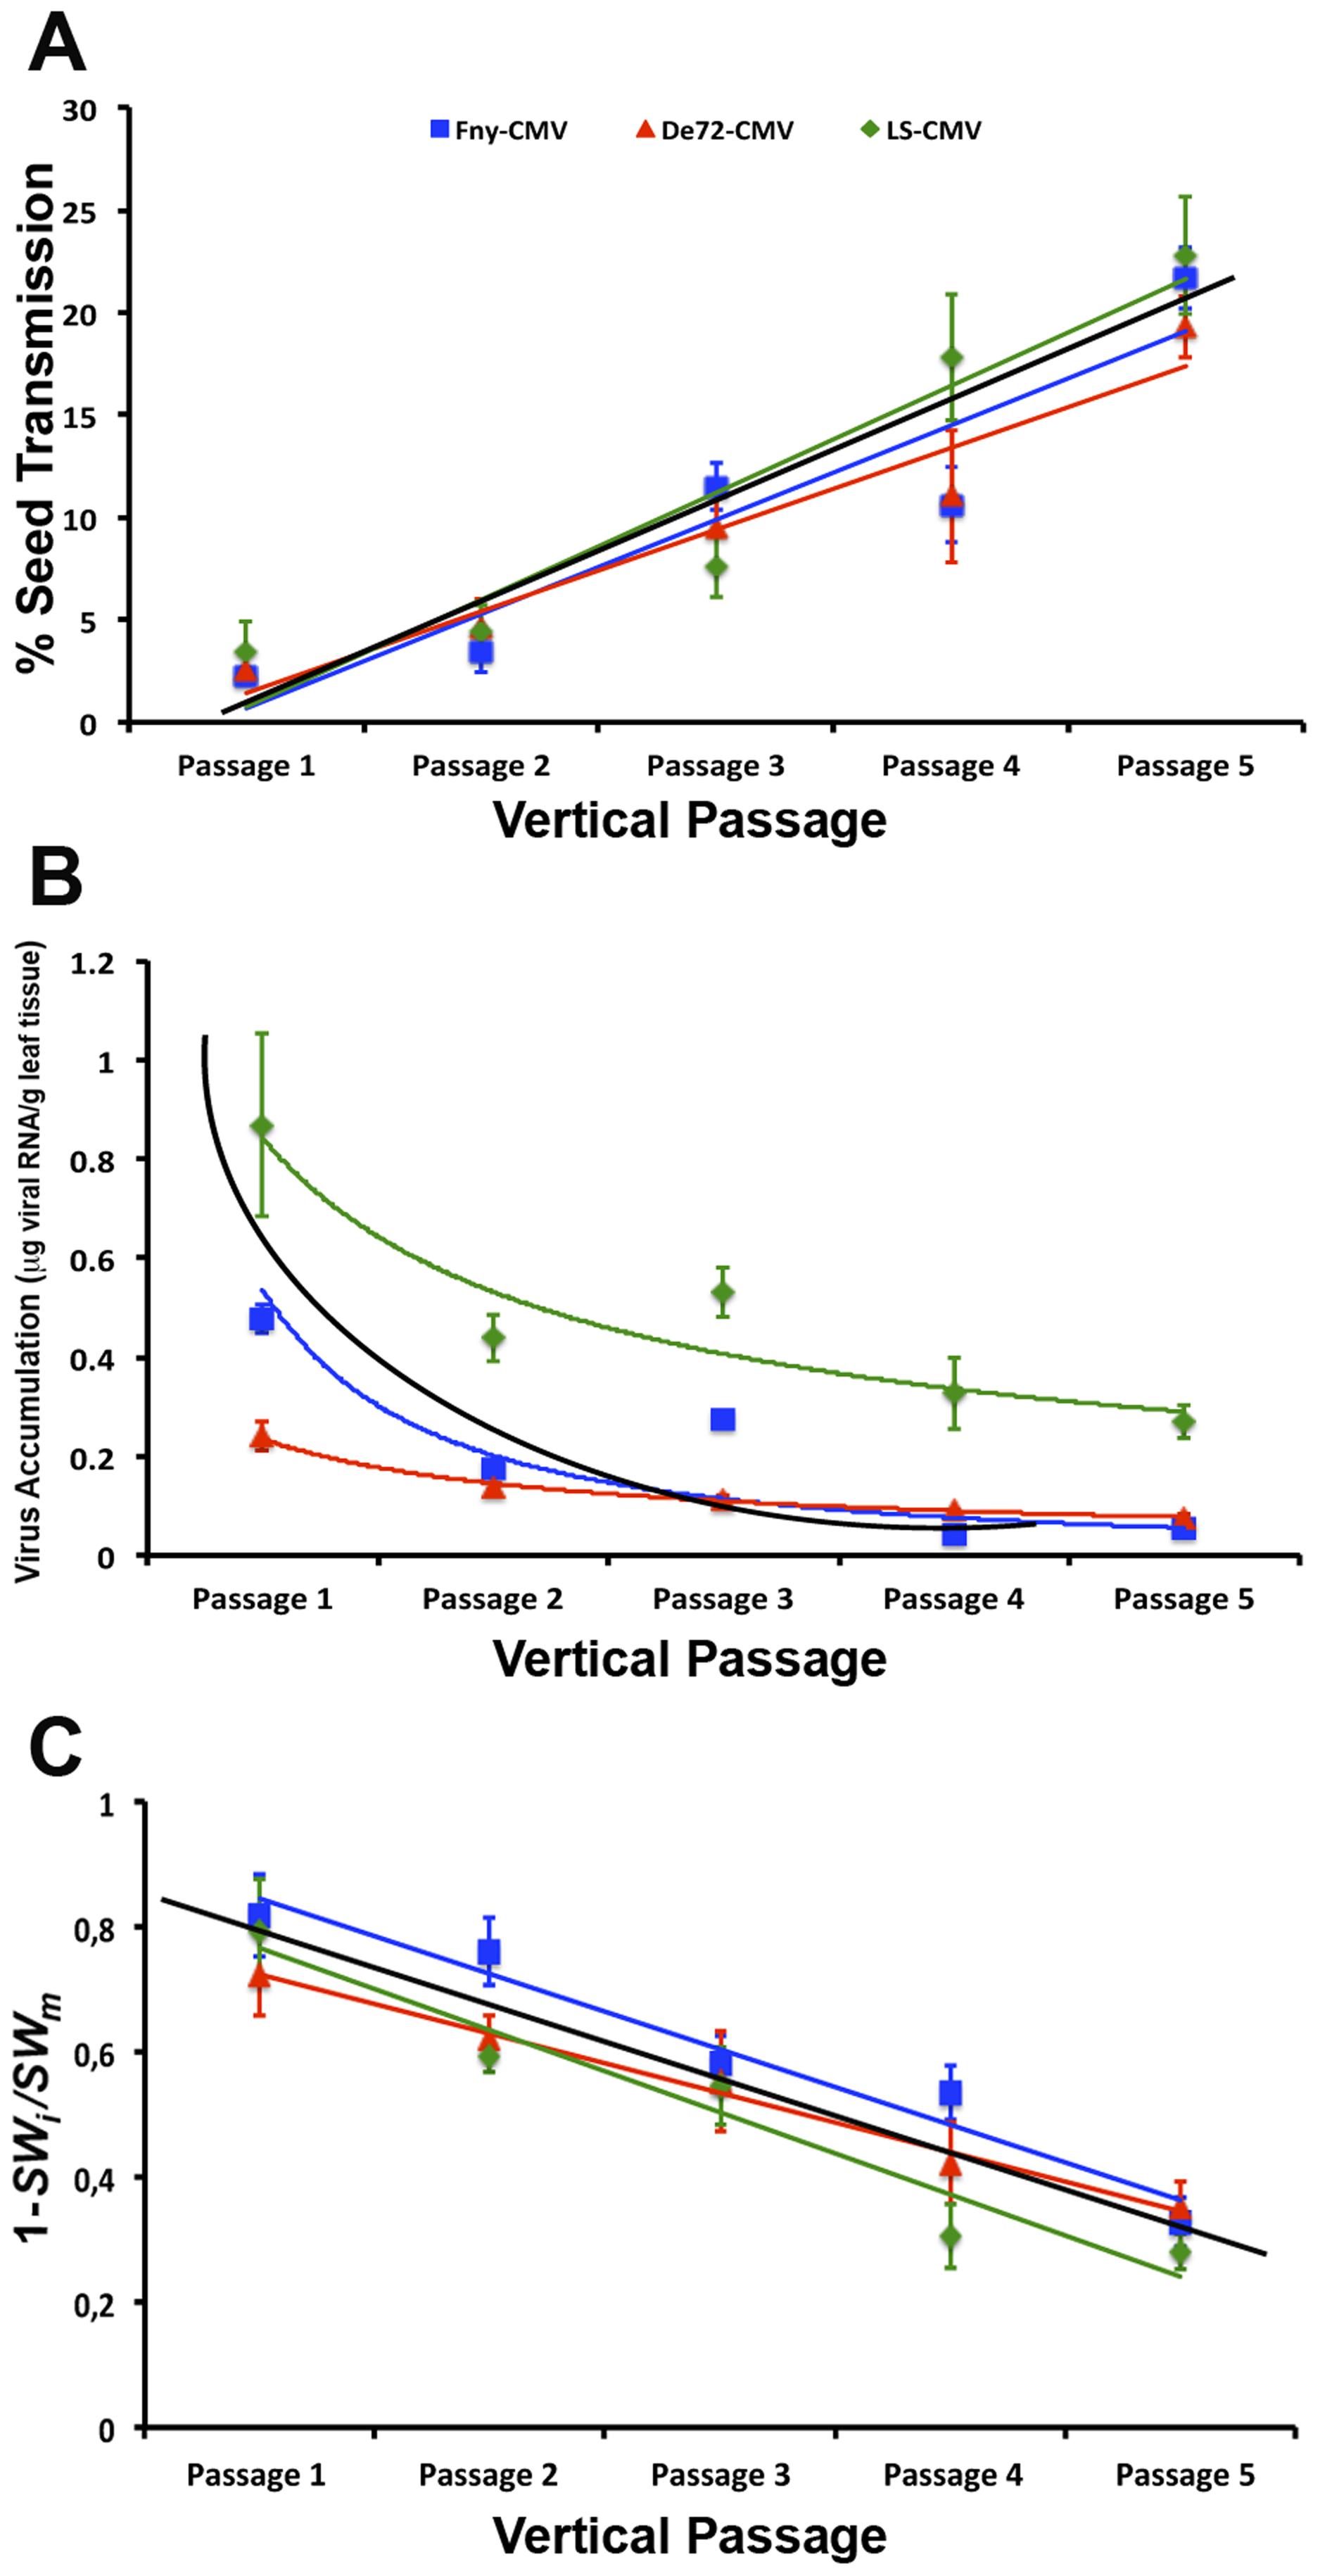 Evolution of CMV seed transmission, virus accumulation and virulence across passages of vertical transmission.